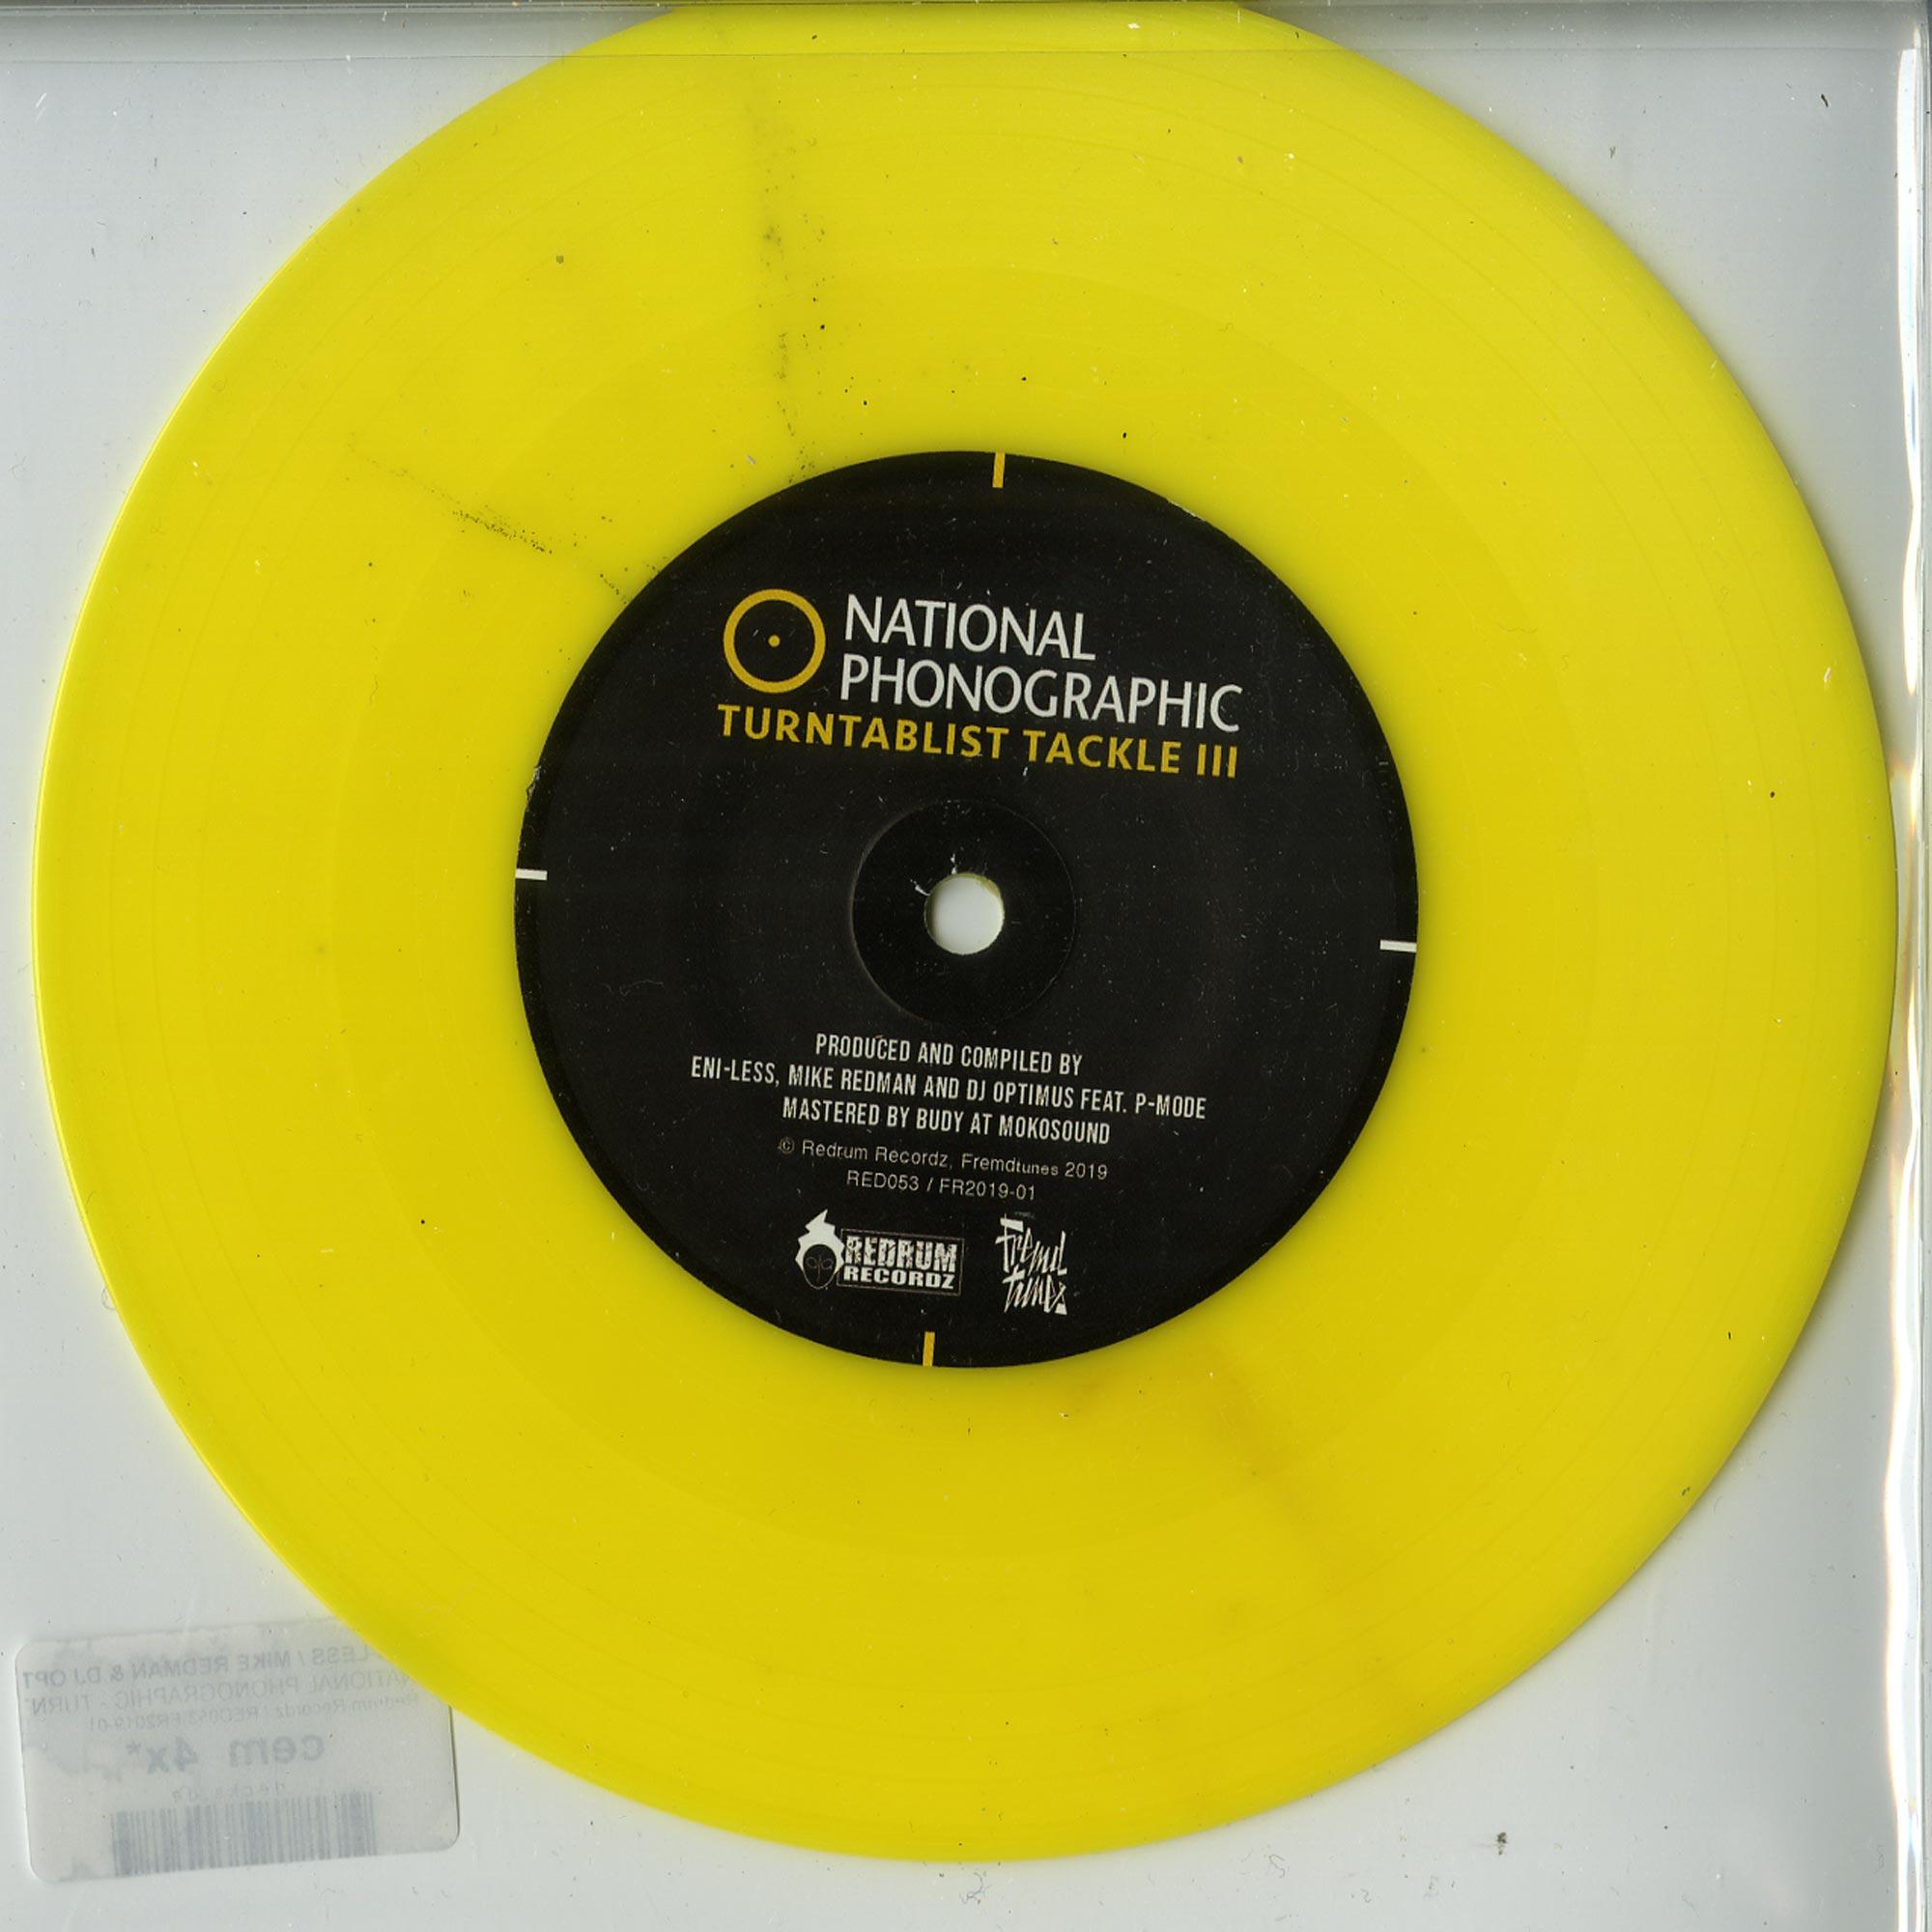 Eni-Less / Mike Redman & DJ Optimus - NATIONAL PHONOGRAPHIC - TURNTABLIST TACKLE 3